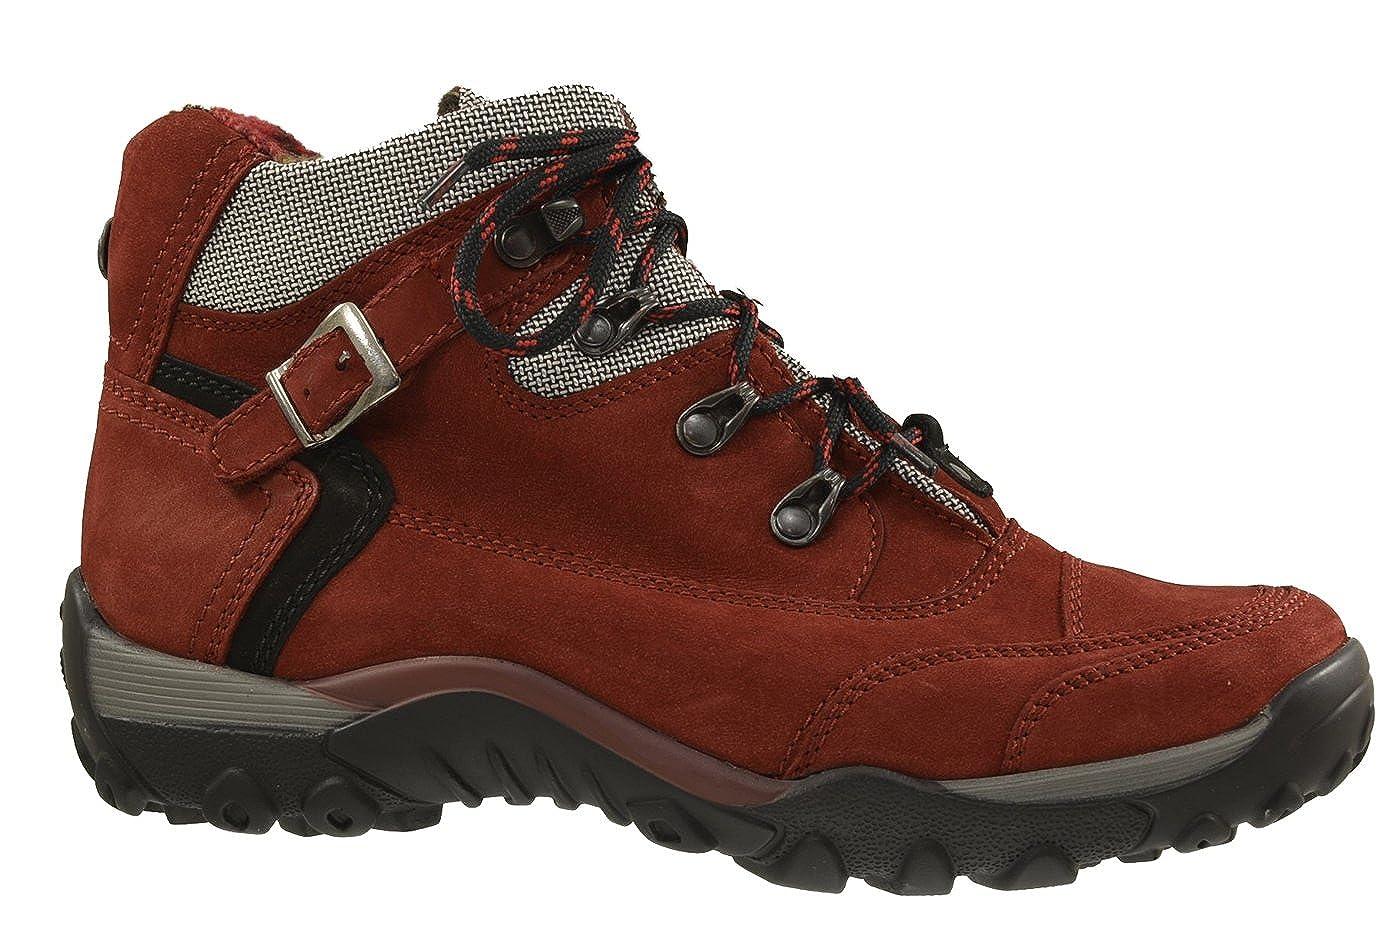 d0eeadc416c4 Waldläufer Damen Rot Stiefeletten Hilvi Denver Torrix 519972-452-014 Rot  Damen 23052Rot e8c8d3